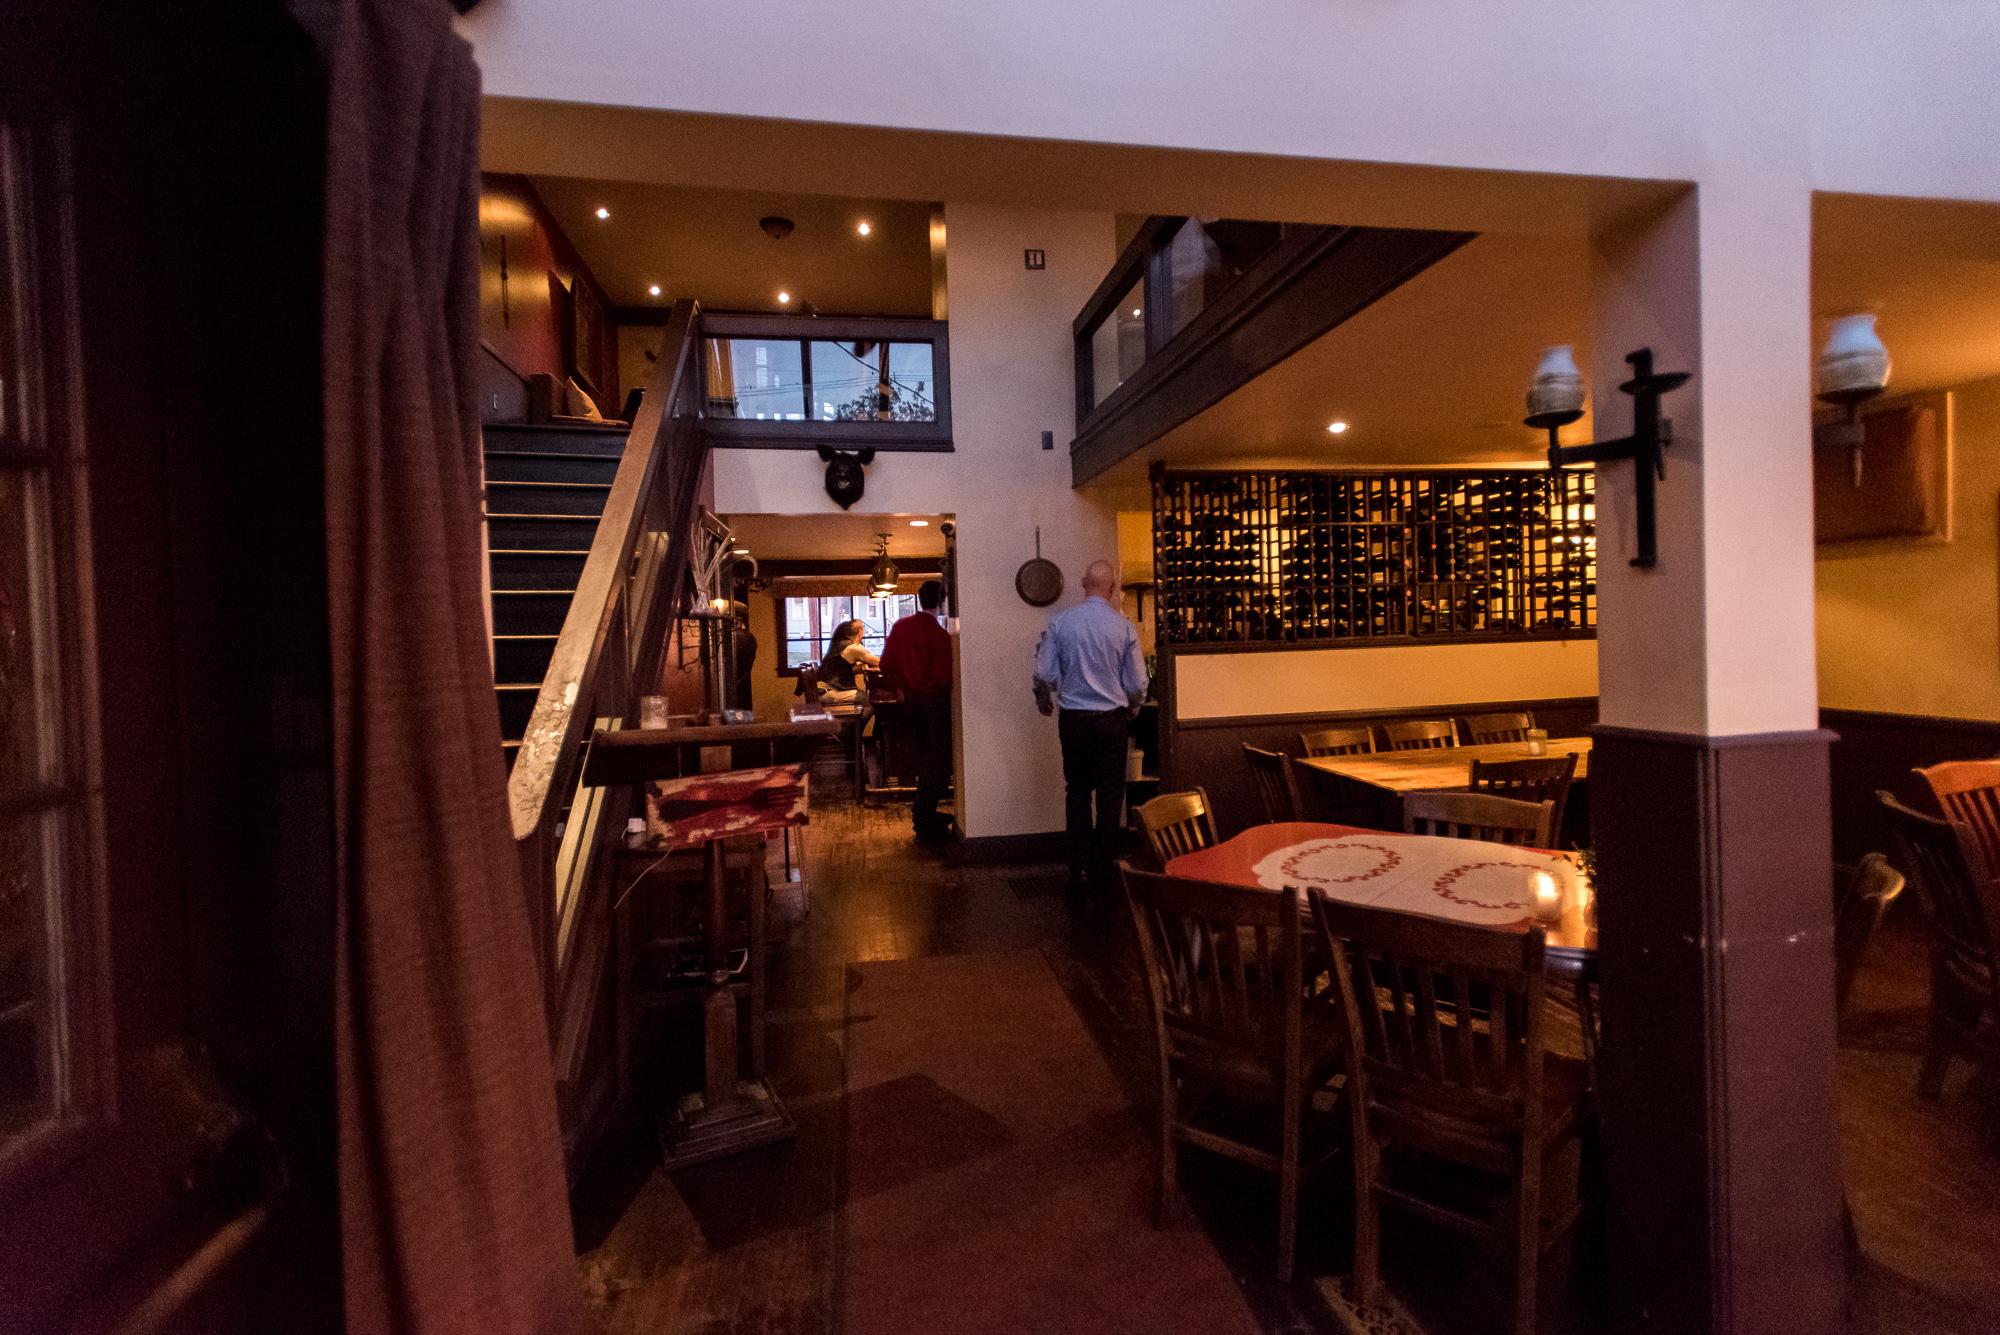 A-Tavola-Trattoria-New-Paltz-Hudson-Valley-NY-Best-Italian-Restaurant-239.jpg